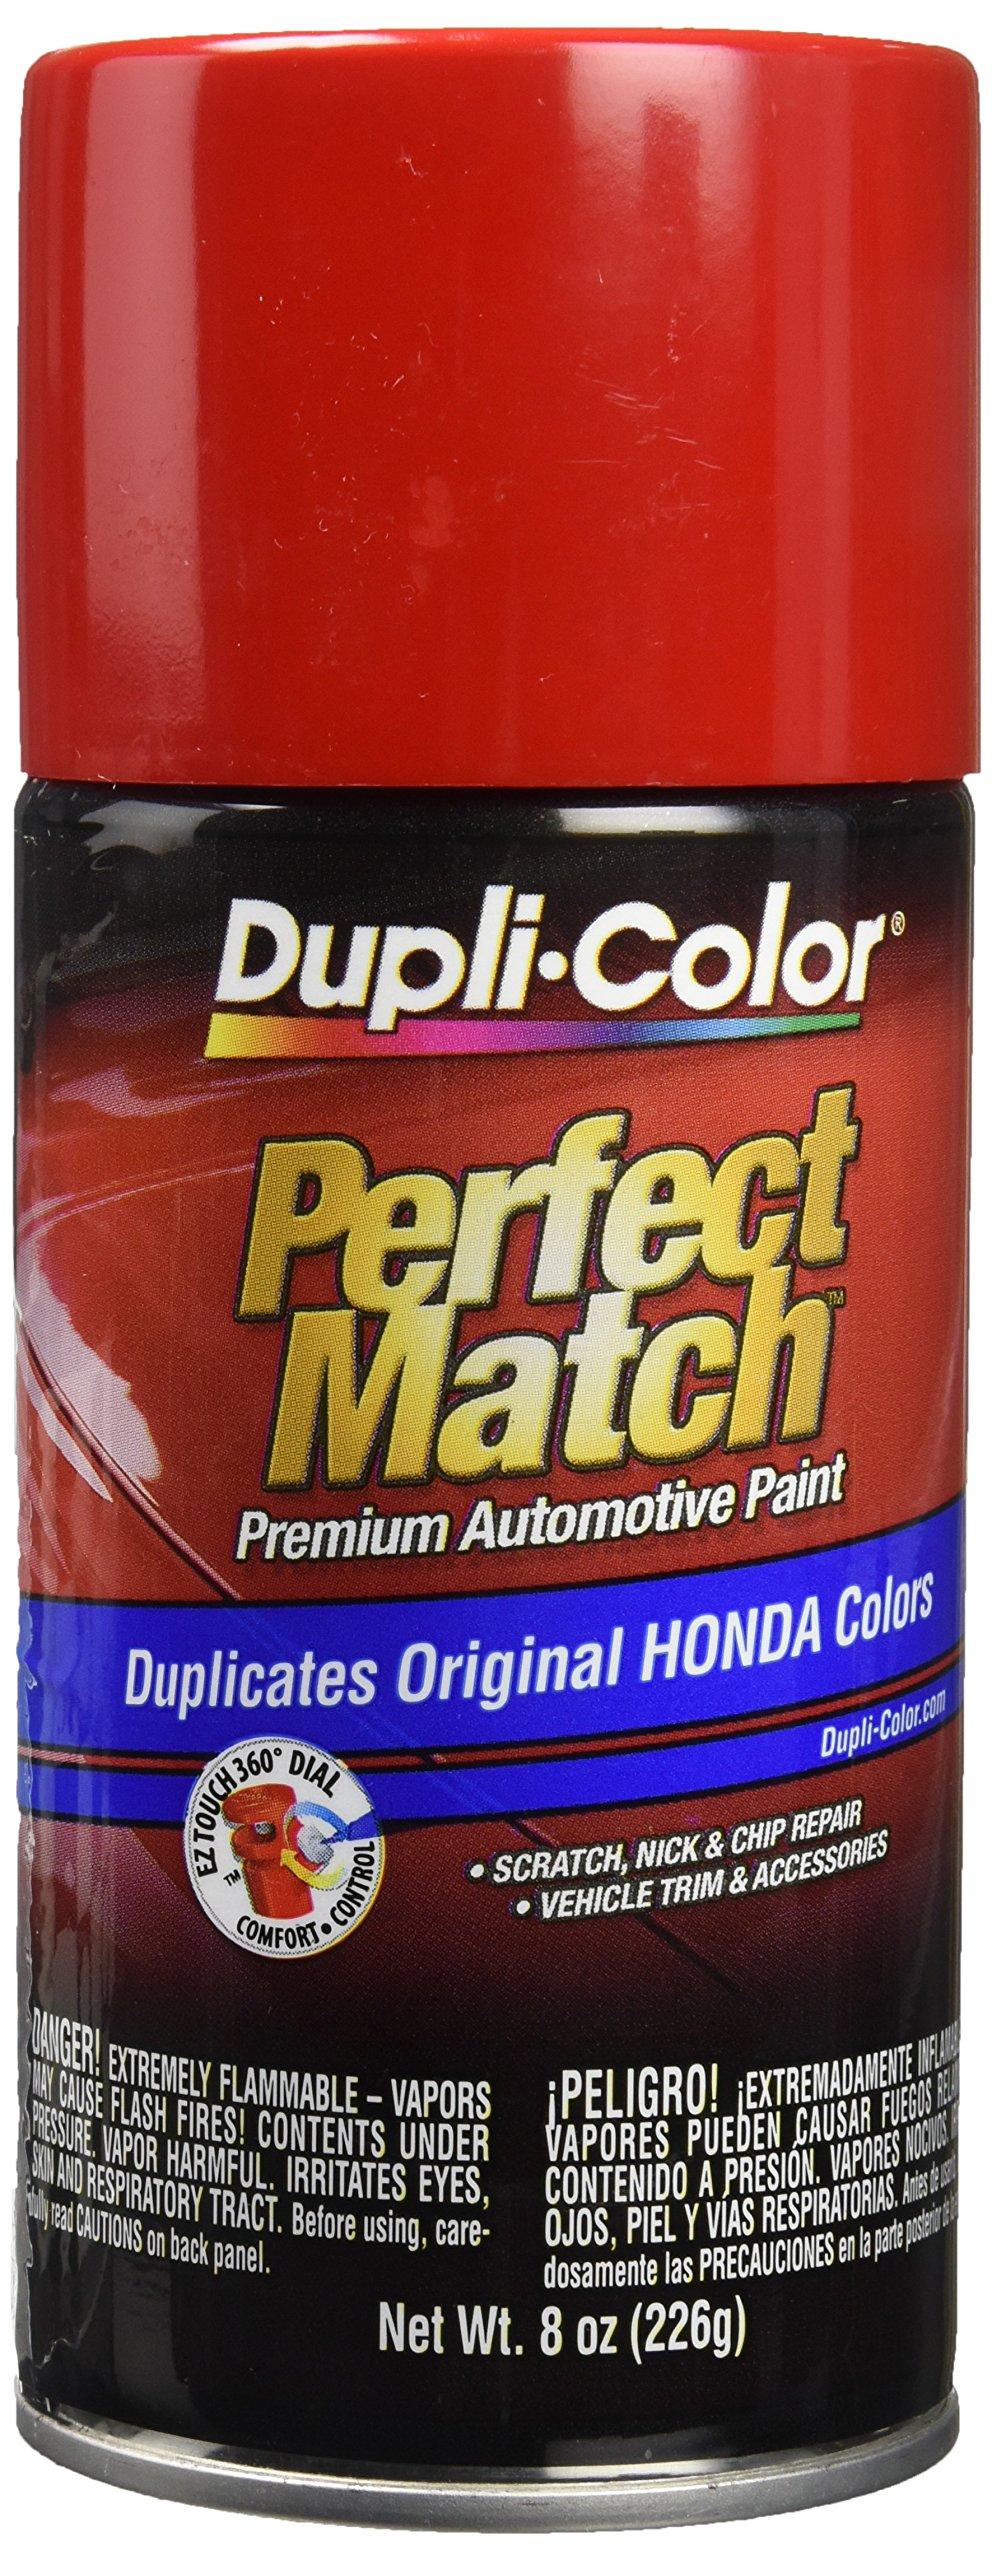 Dupli-Color EBHA09750 Red 8 Oz Rallye Red R513 Perfect Match Premium Automotive Paint, 8 Oz